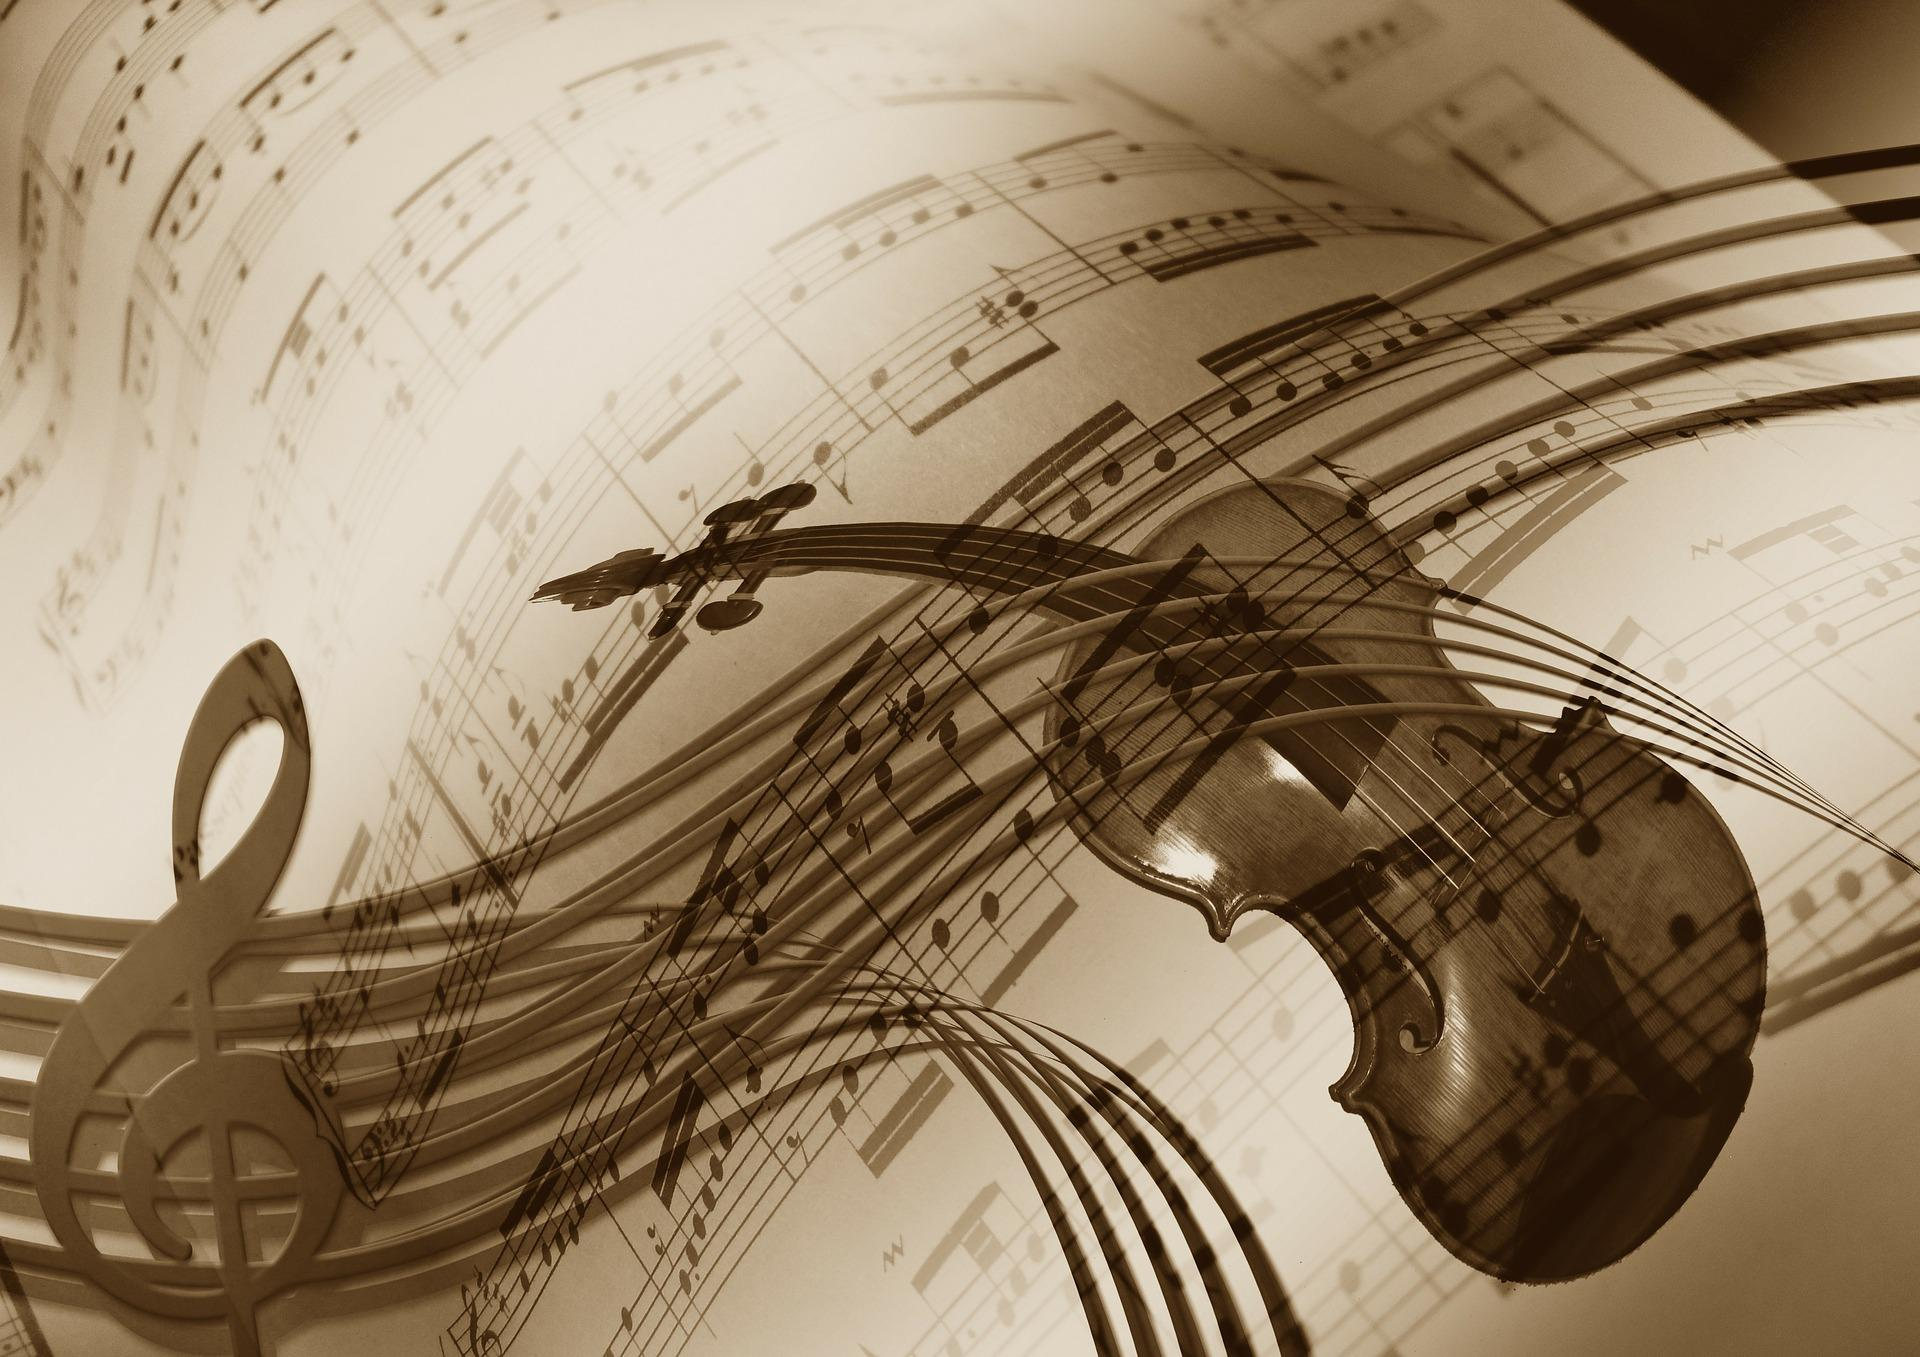 Violín sobre partitura